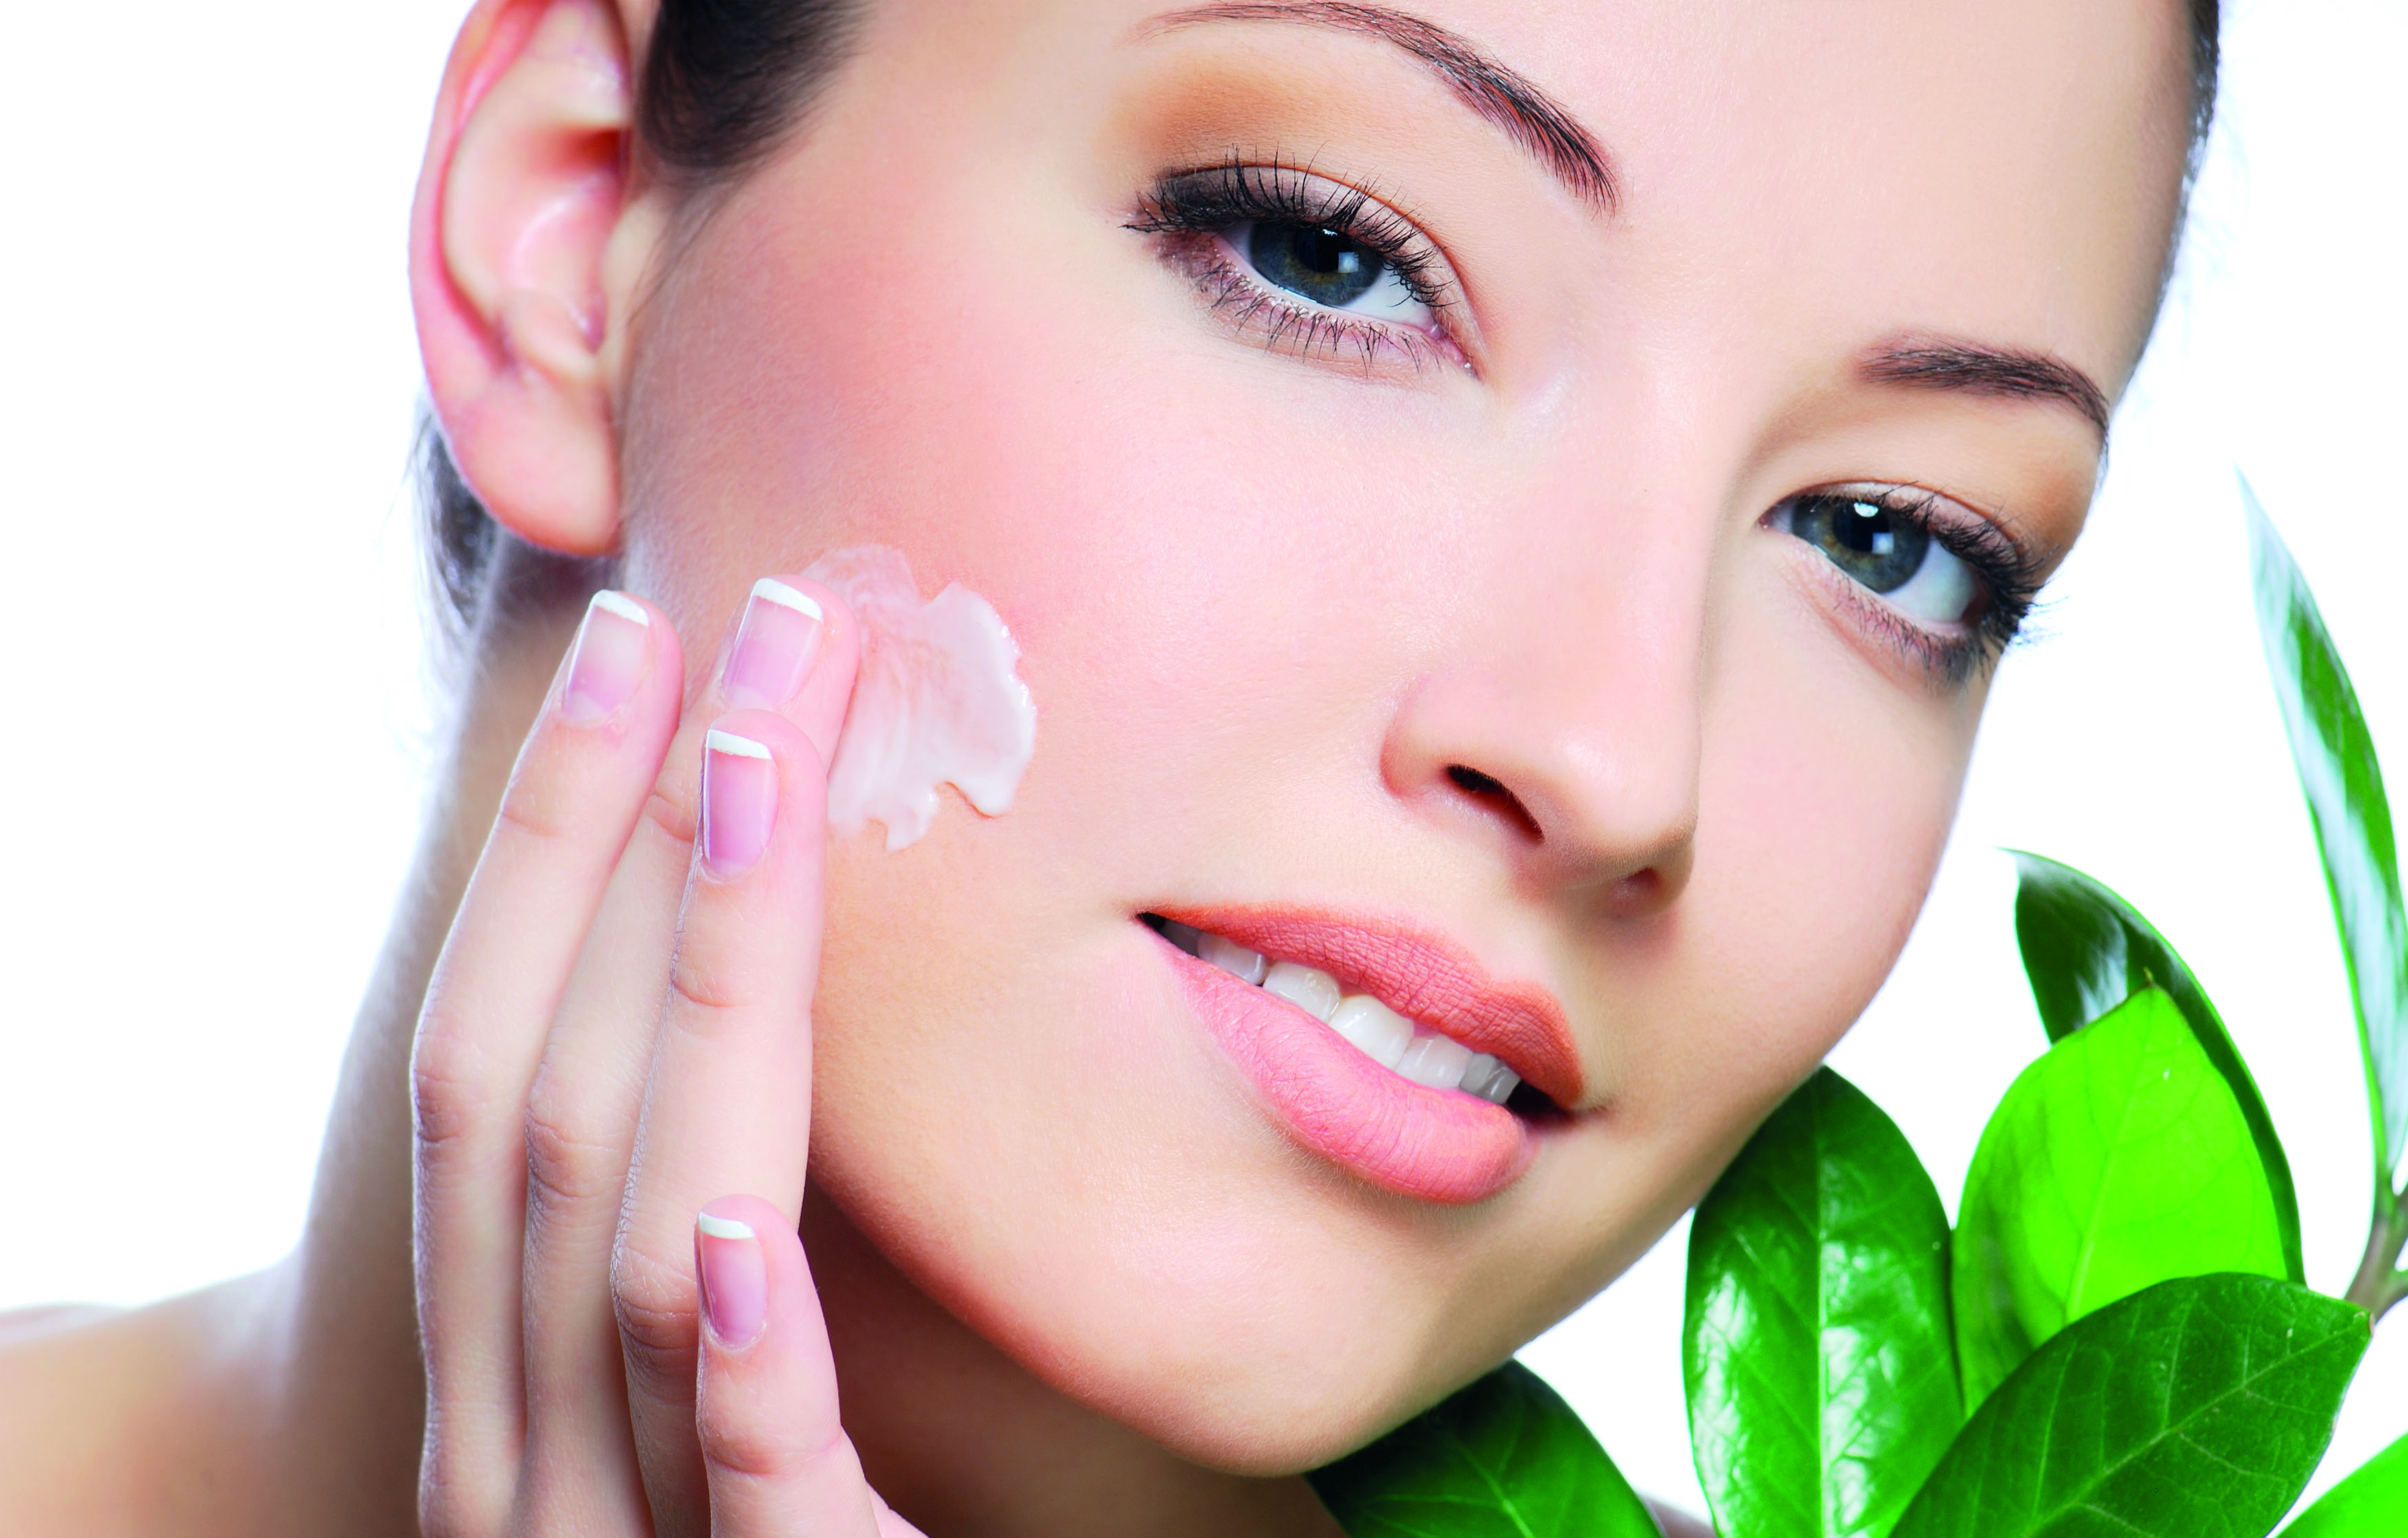 gelaatsverzorging en make-up